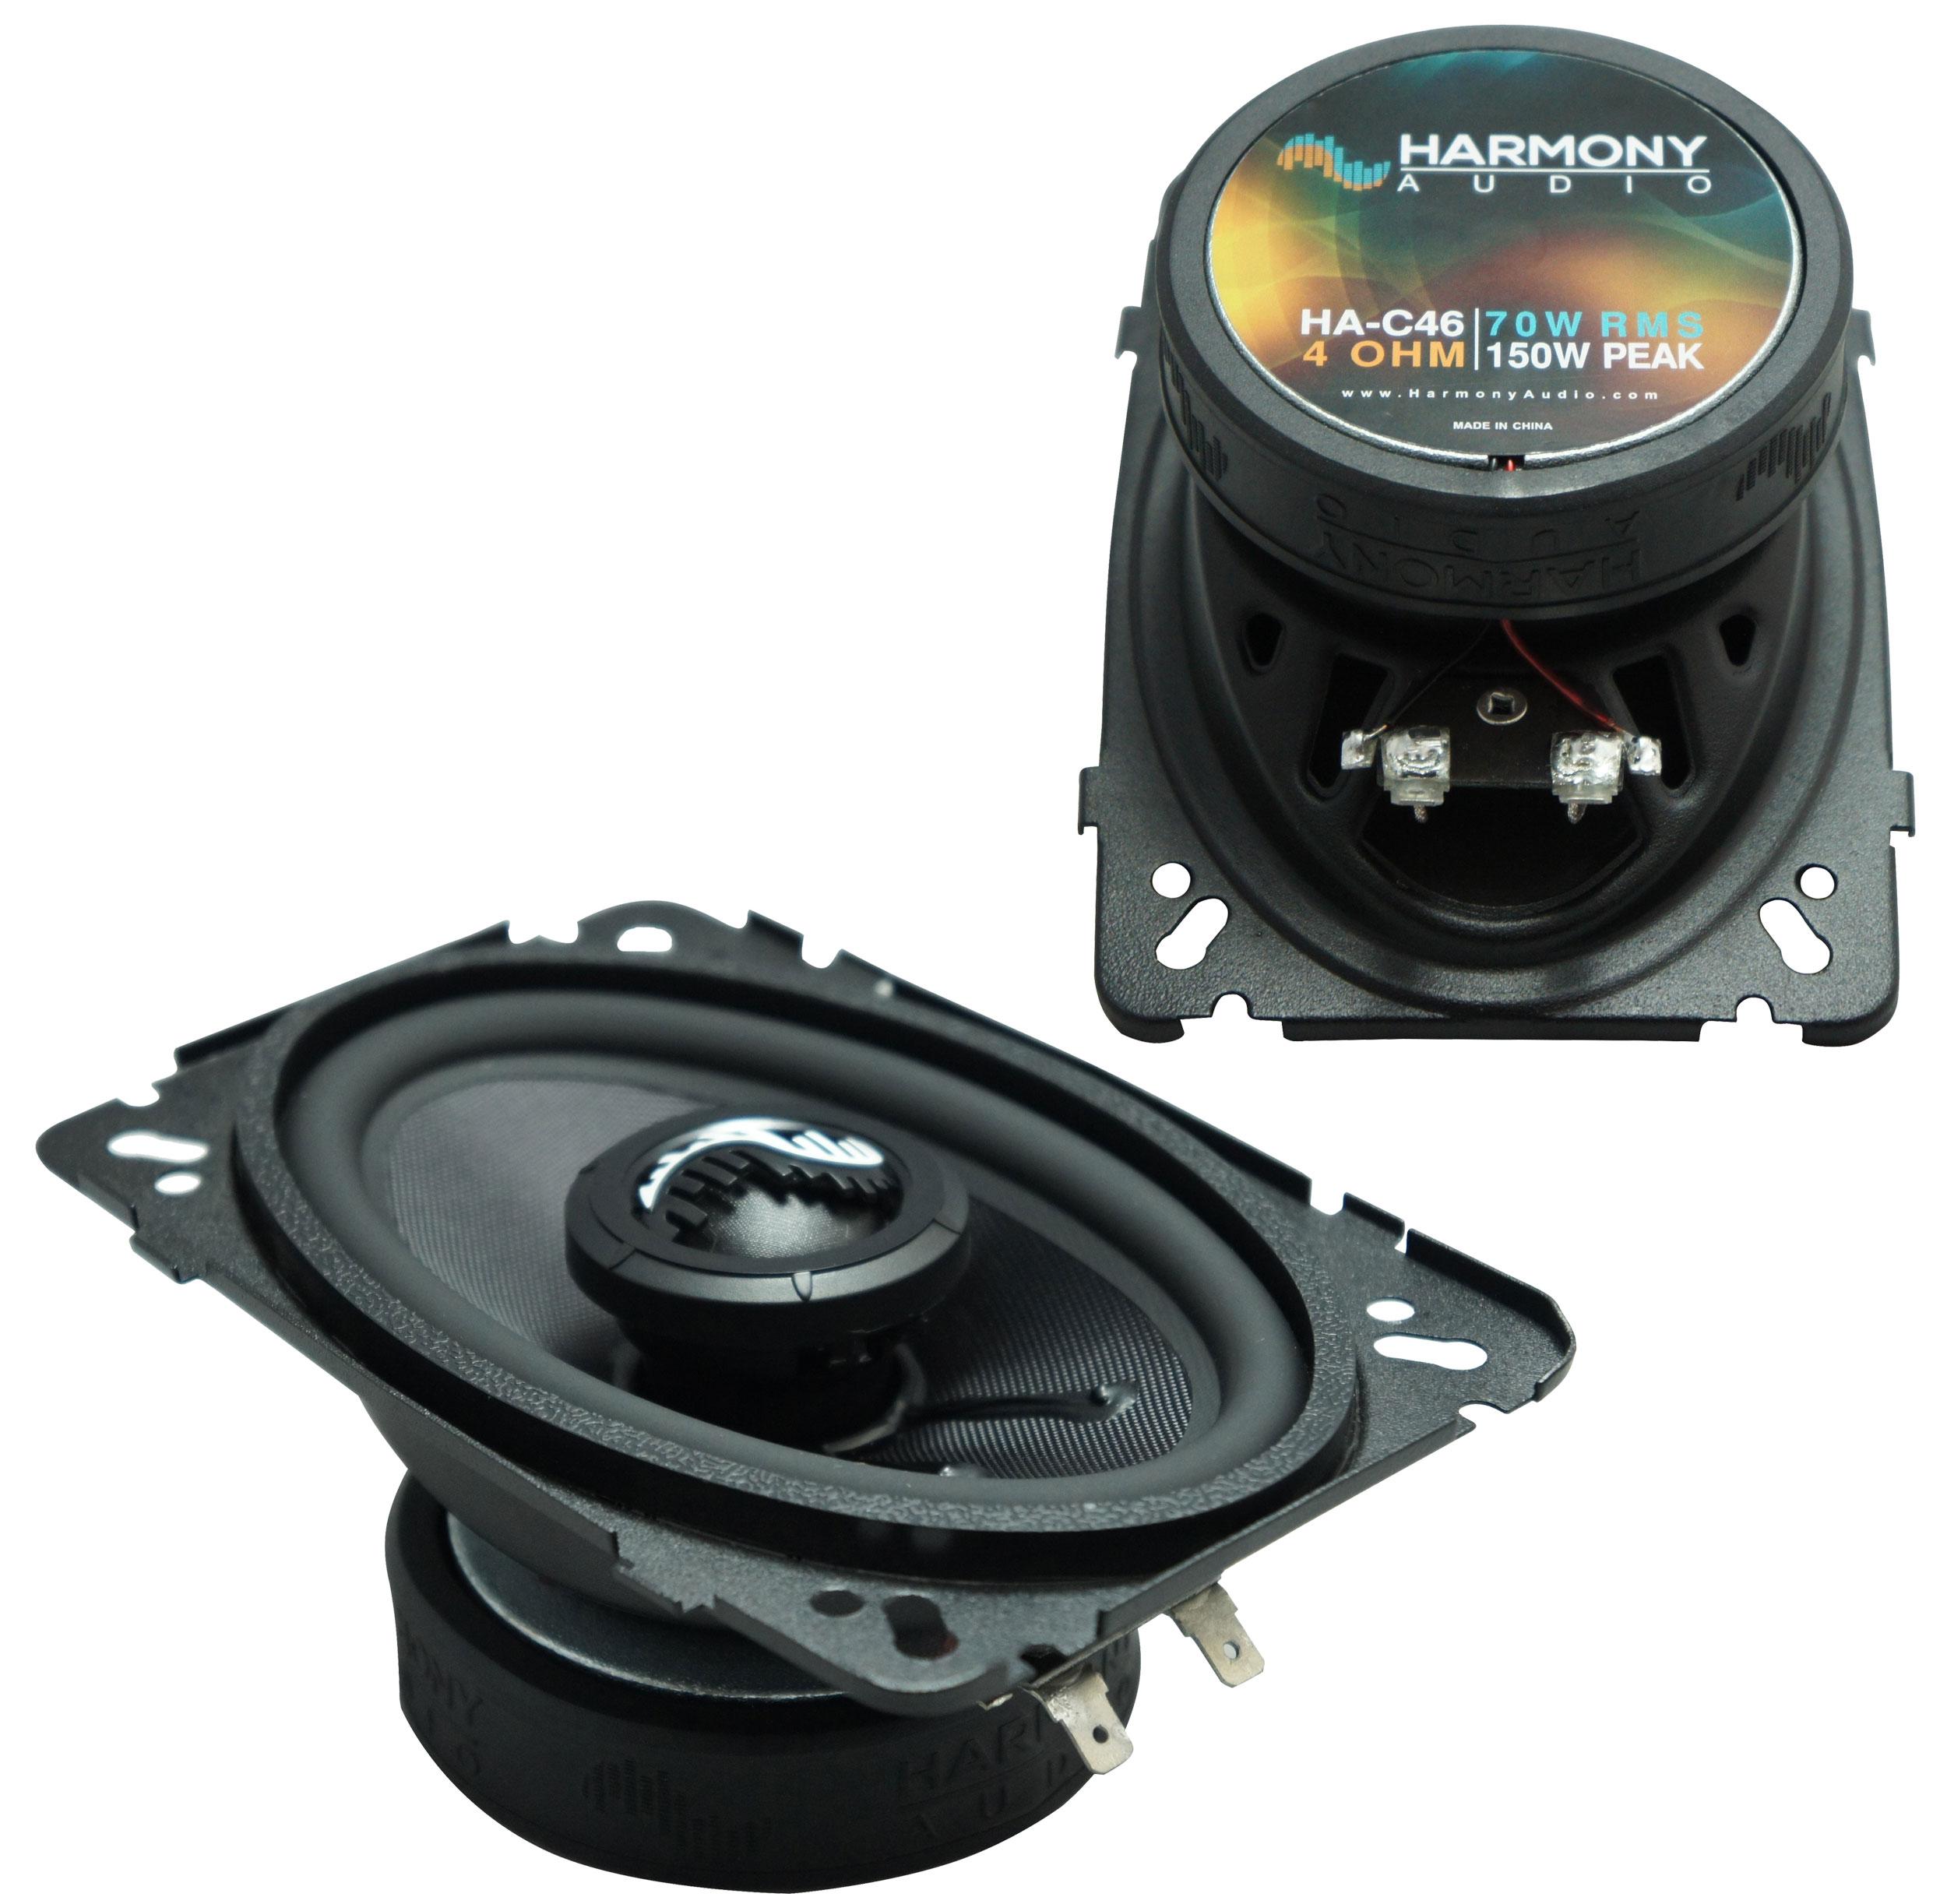 Fits Oldsmobile Alero 1999-2000 Front Door Replacement Speaker HA-C46 Premium Speakers